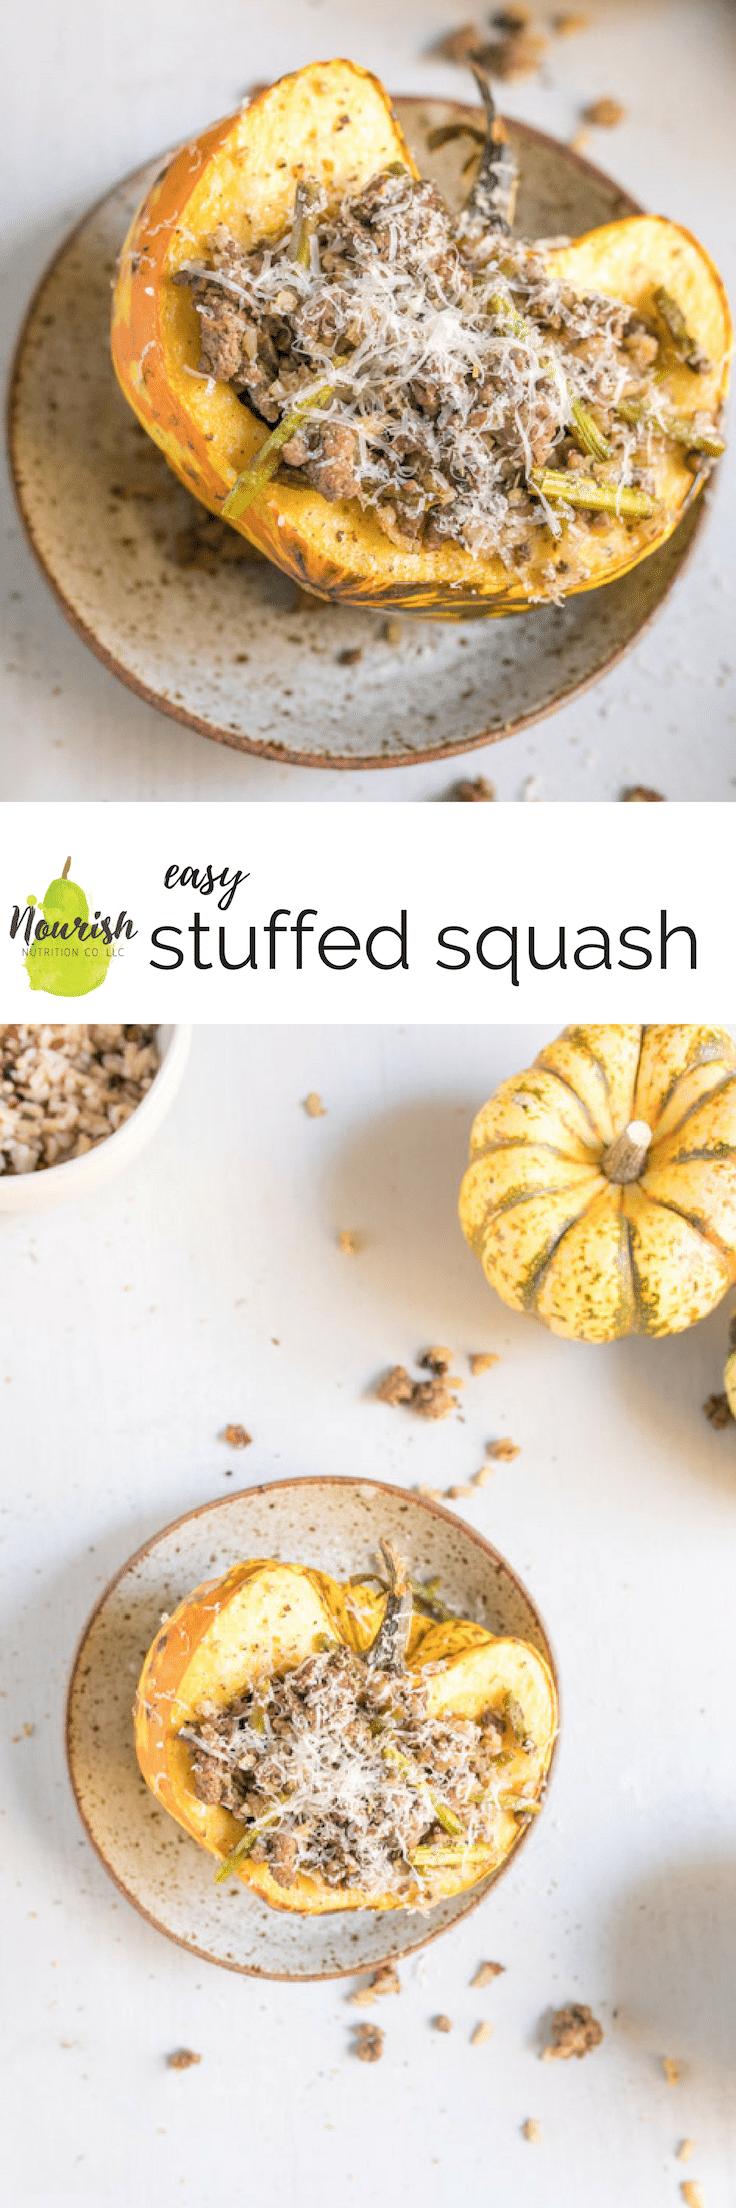 Stuffed Acorn Squash Recipe Food Recipes Beef Rice Fall Recipes